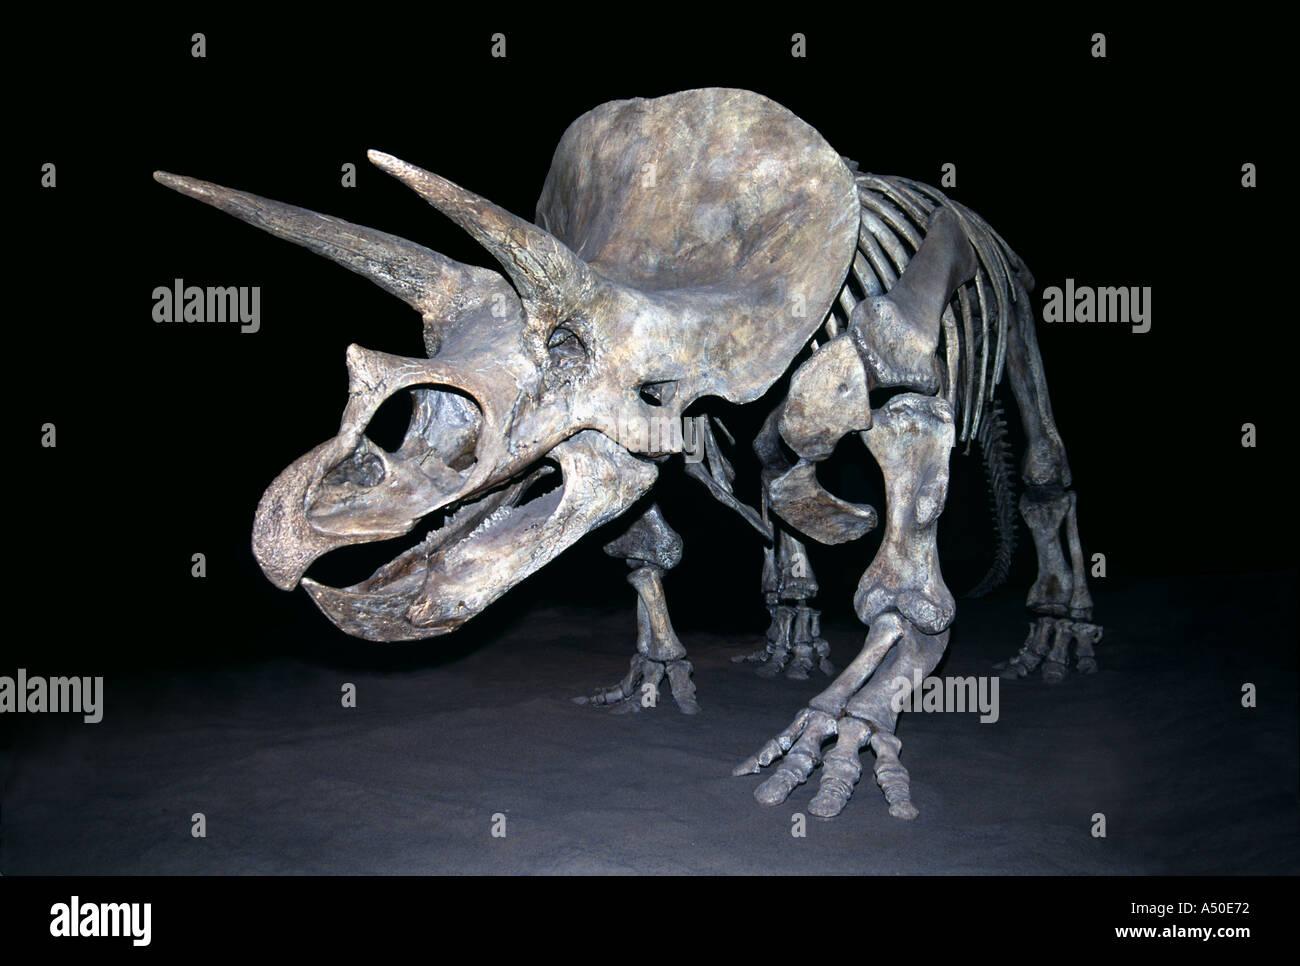 Triceratops Prehistoric Dinosaur Bones Skeleton Royal Tyrell Museum Alberta Canada - Stock Image